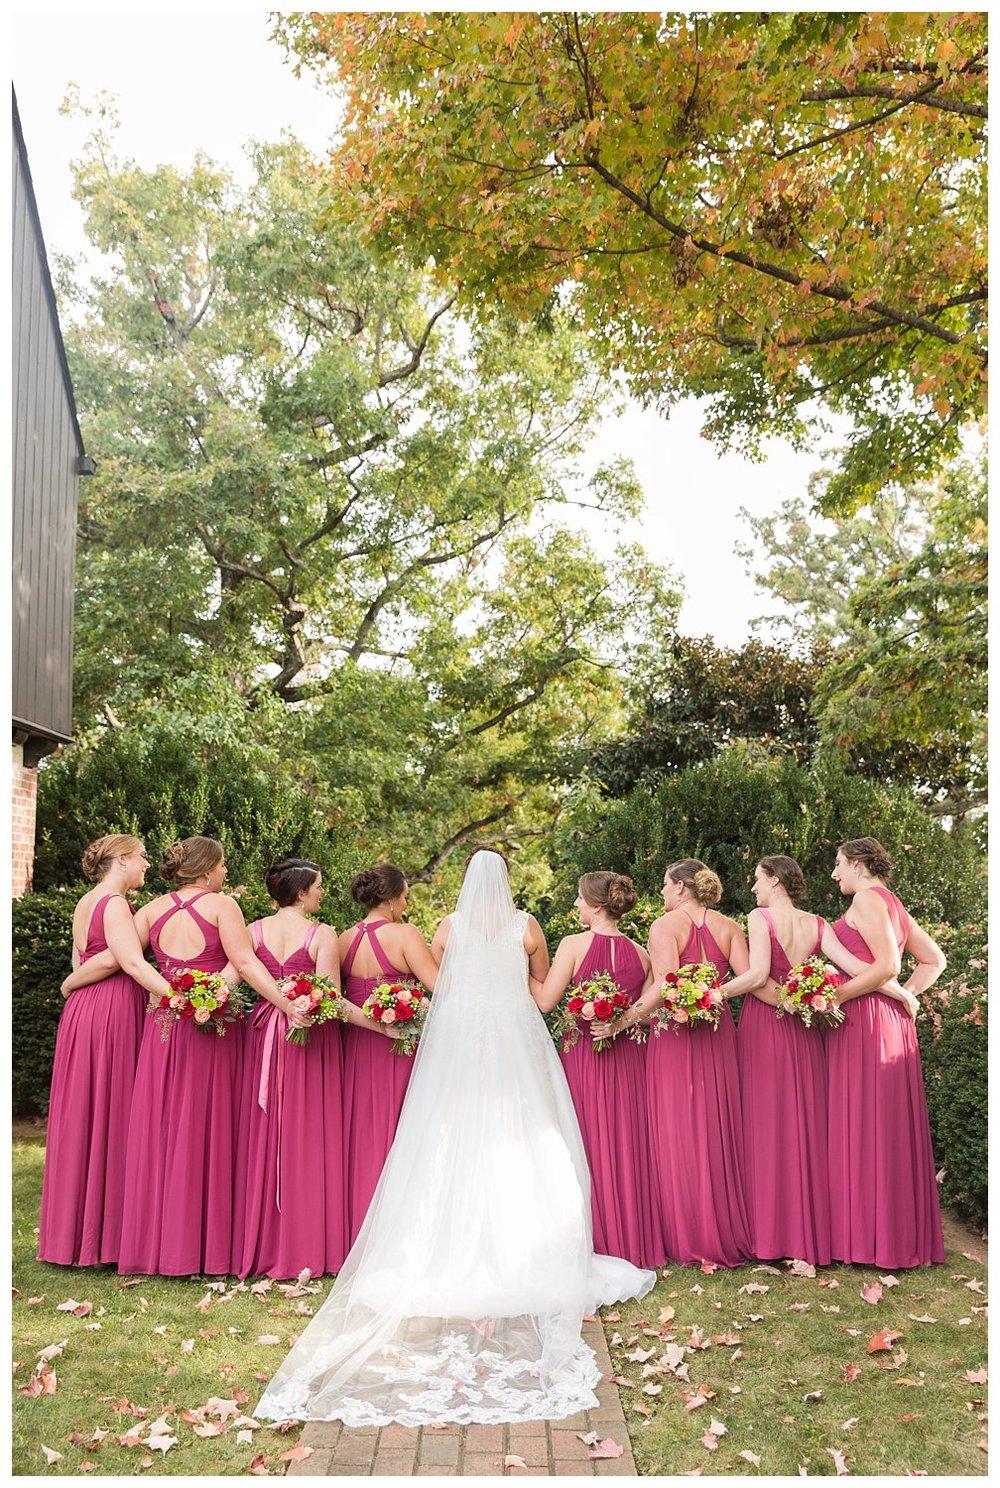 elovephotos gaie lea staunton virginia fall wedding photography_1120.jpg